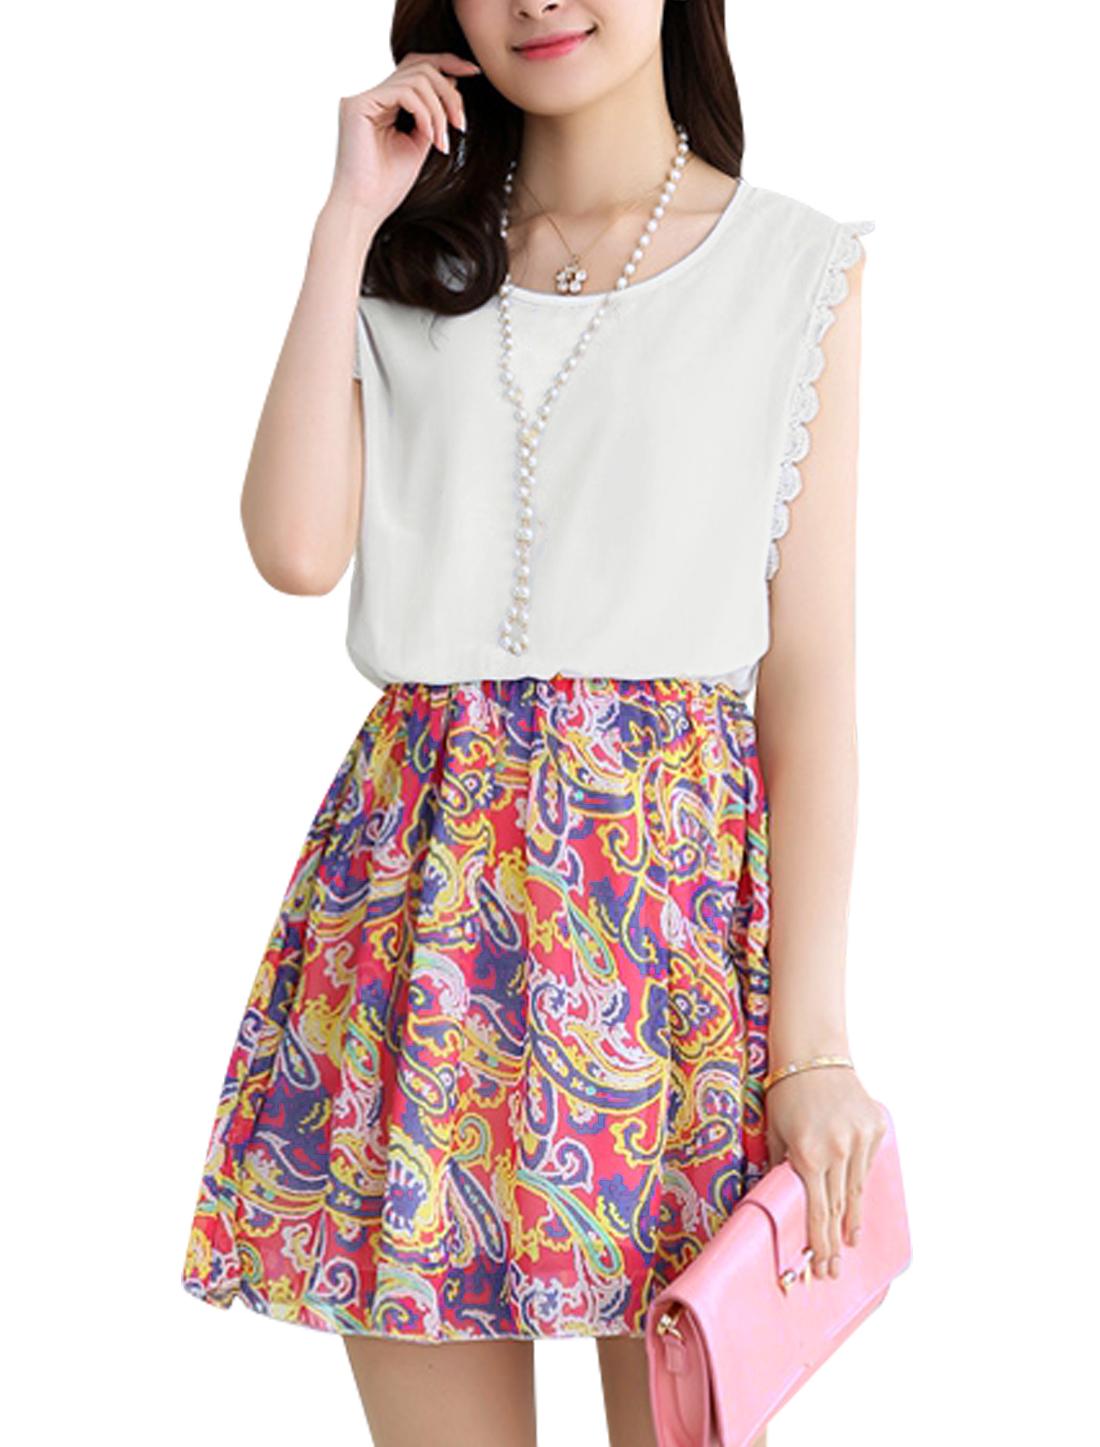 Ladies Flouncing Hem Novelty Prints Sweet Chiffon Tank Dress Fuchsia White S